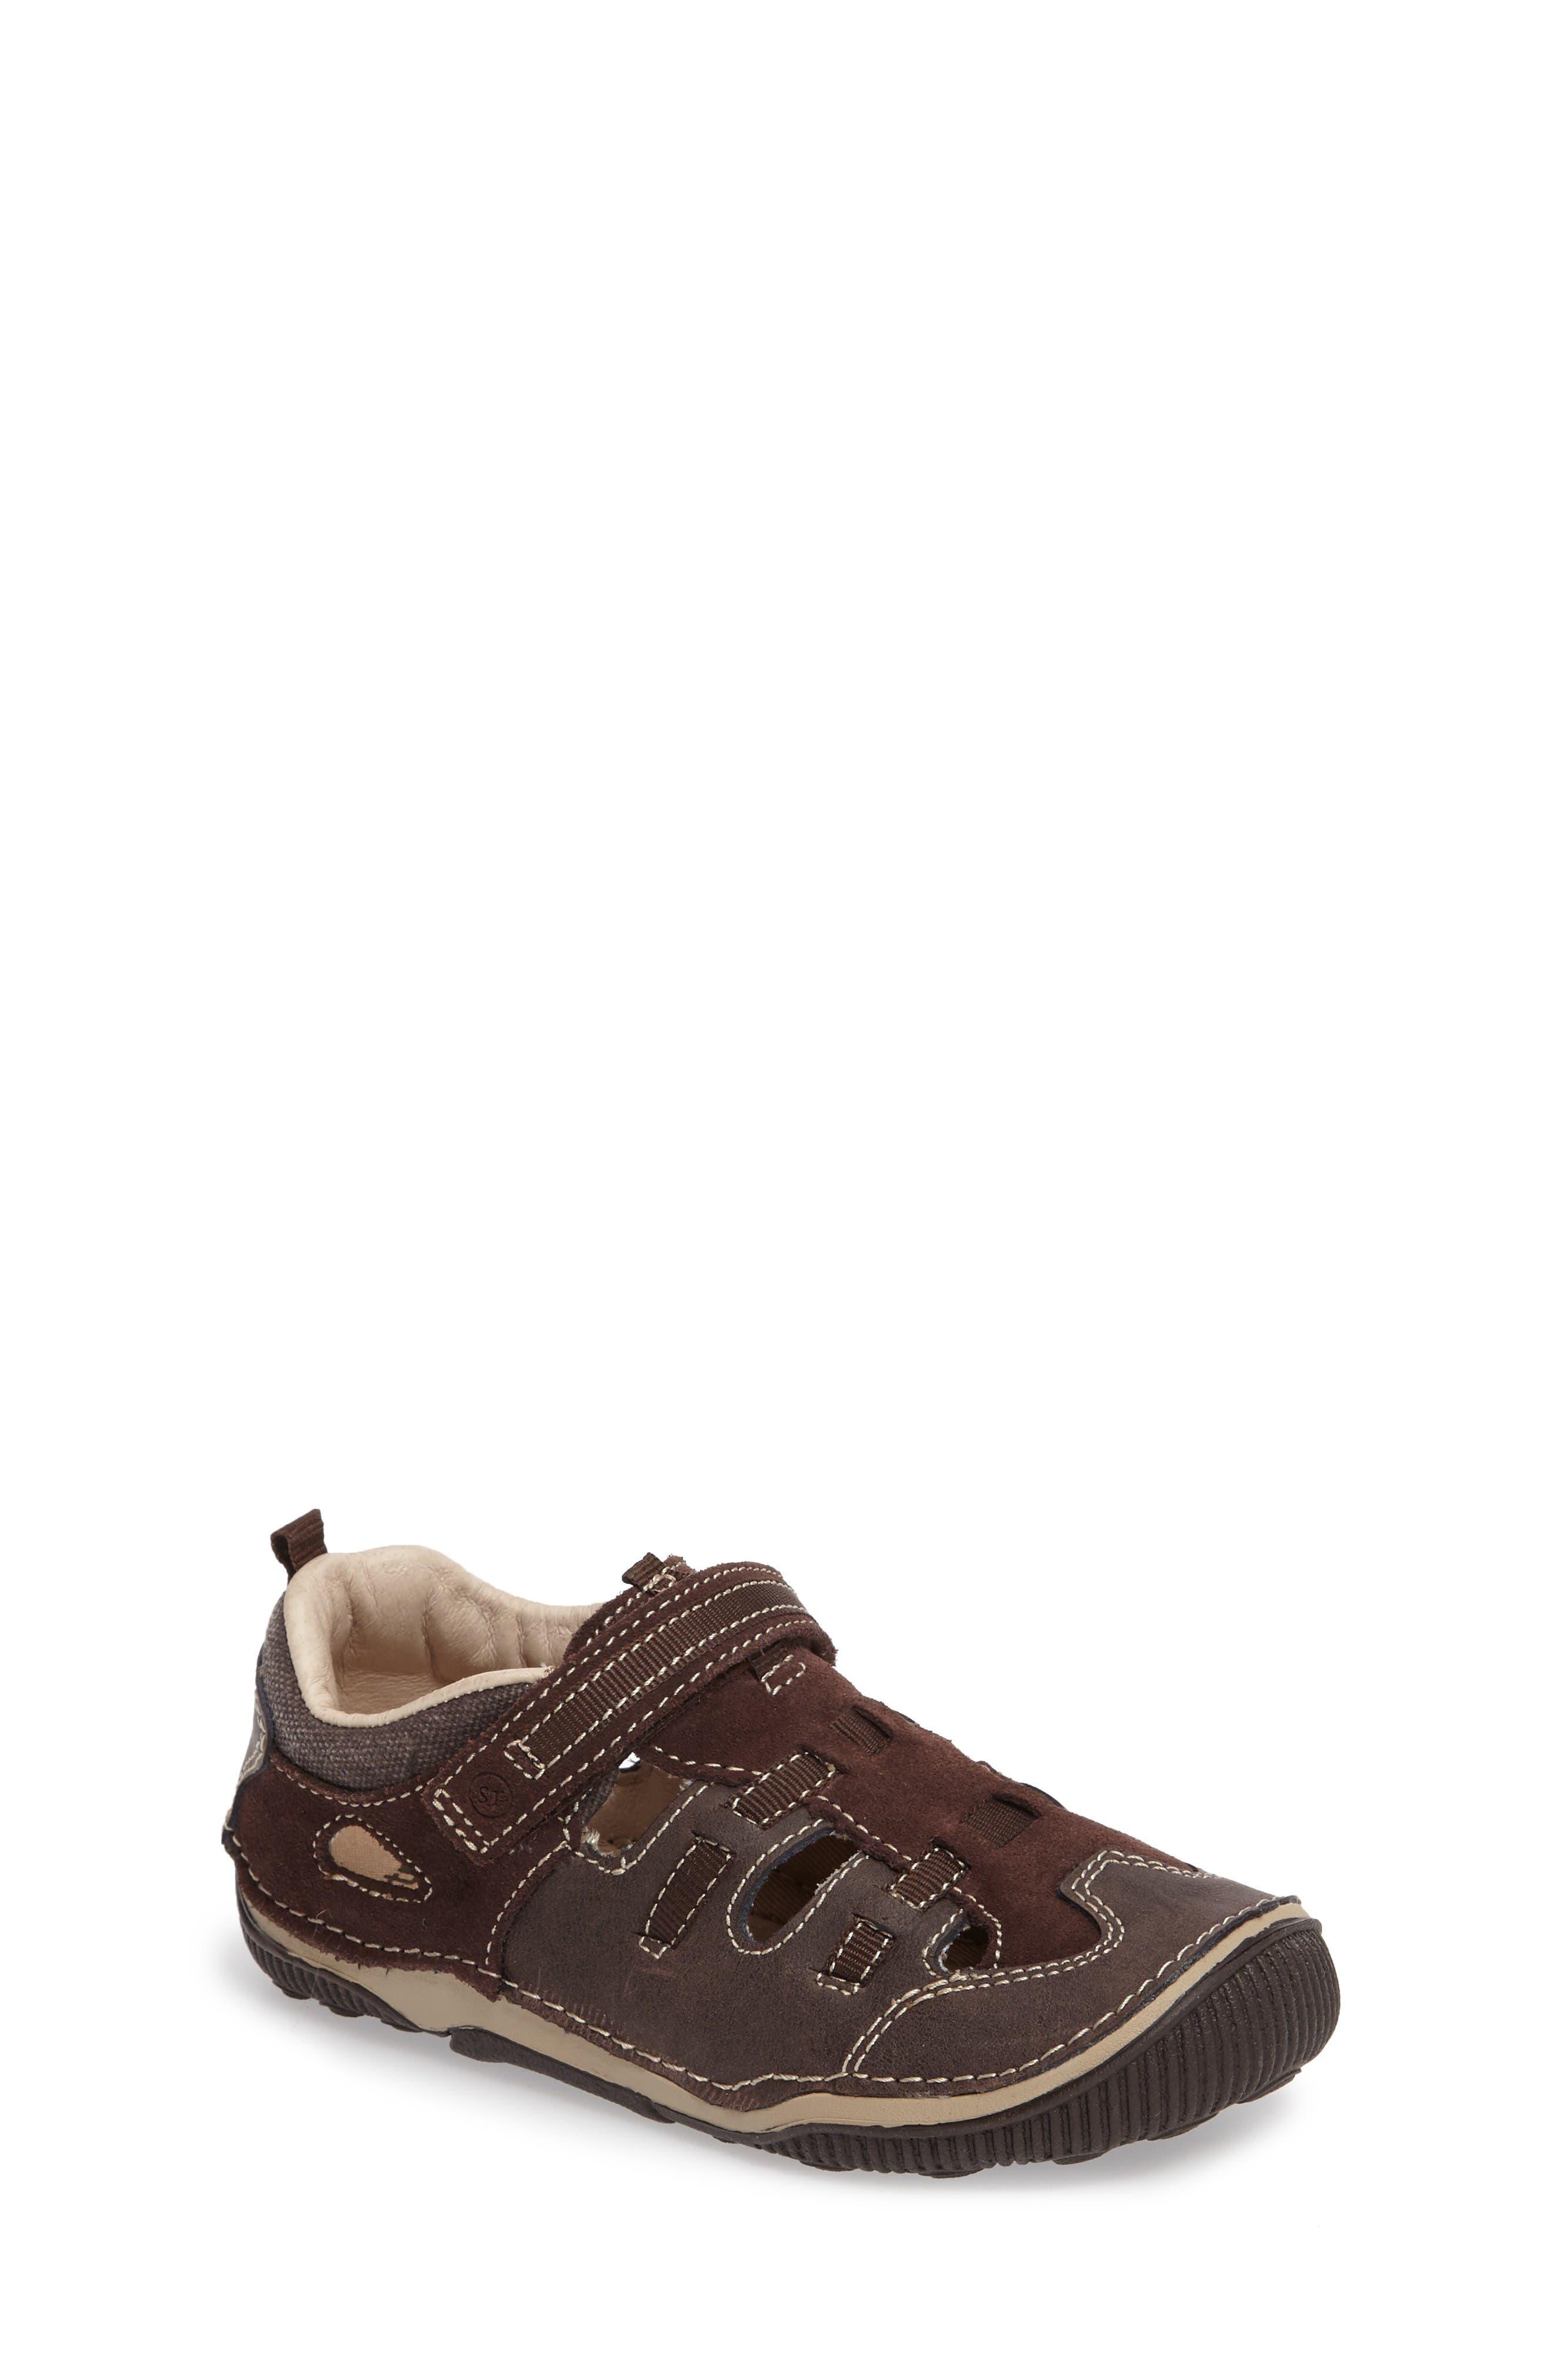 Reggie Cutout Sneaker,                             Main thumbnail 1, color,                             Brown Leather